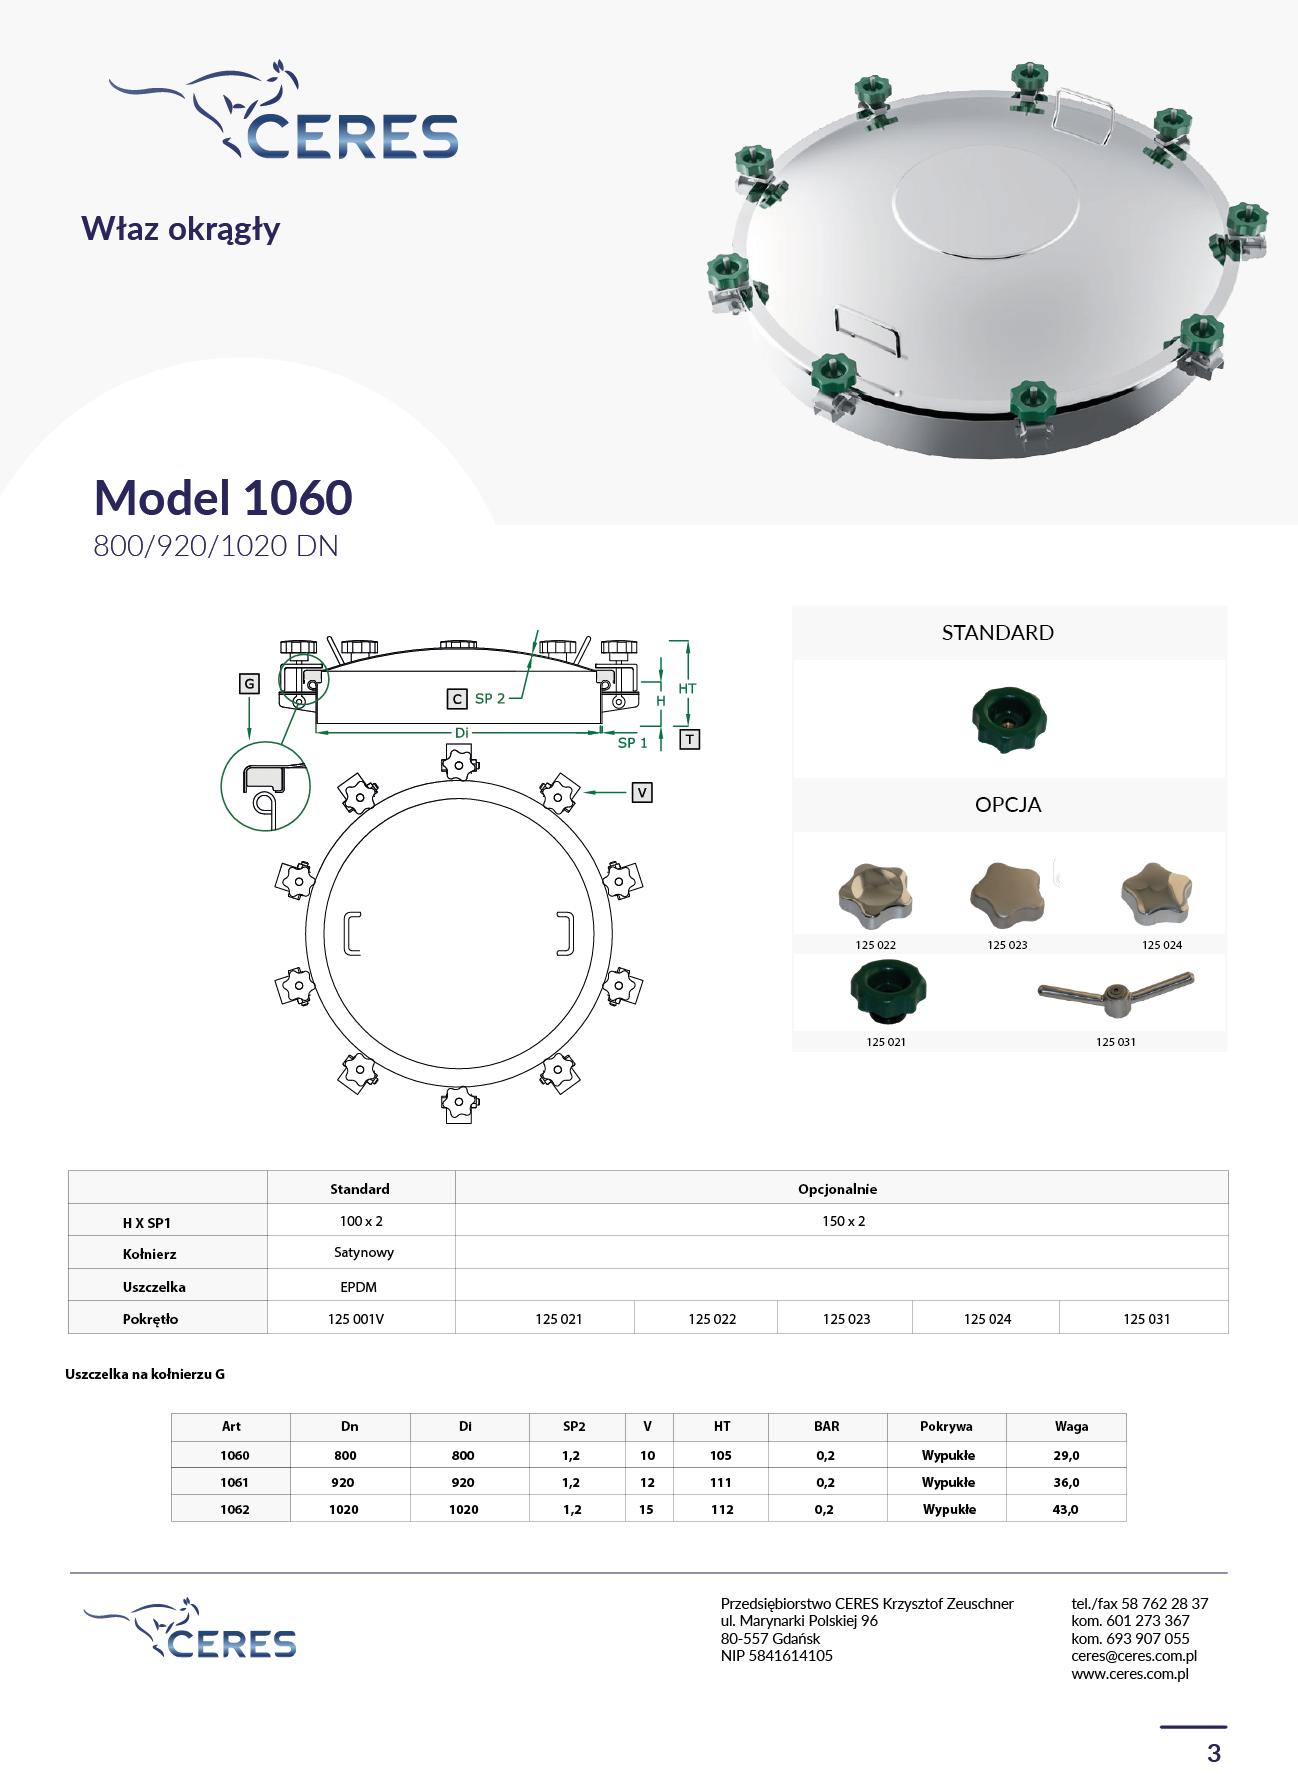 MODEL 1060